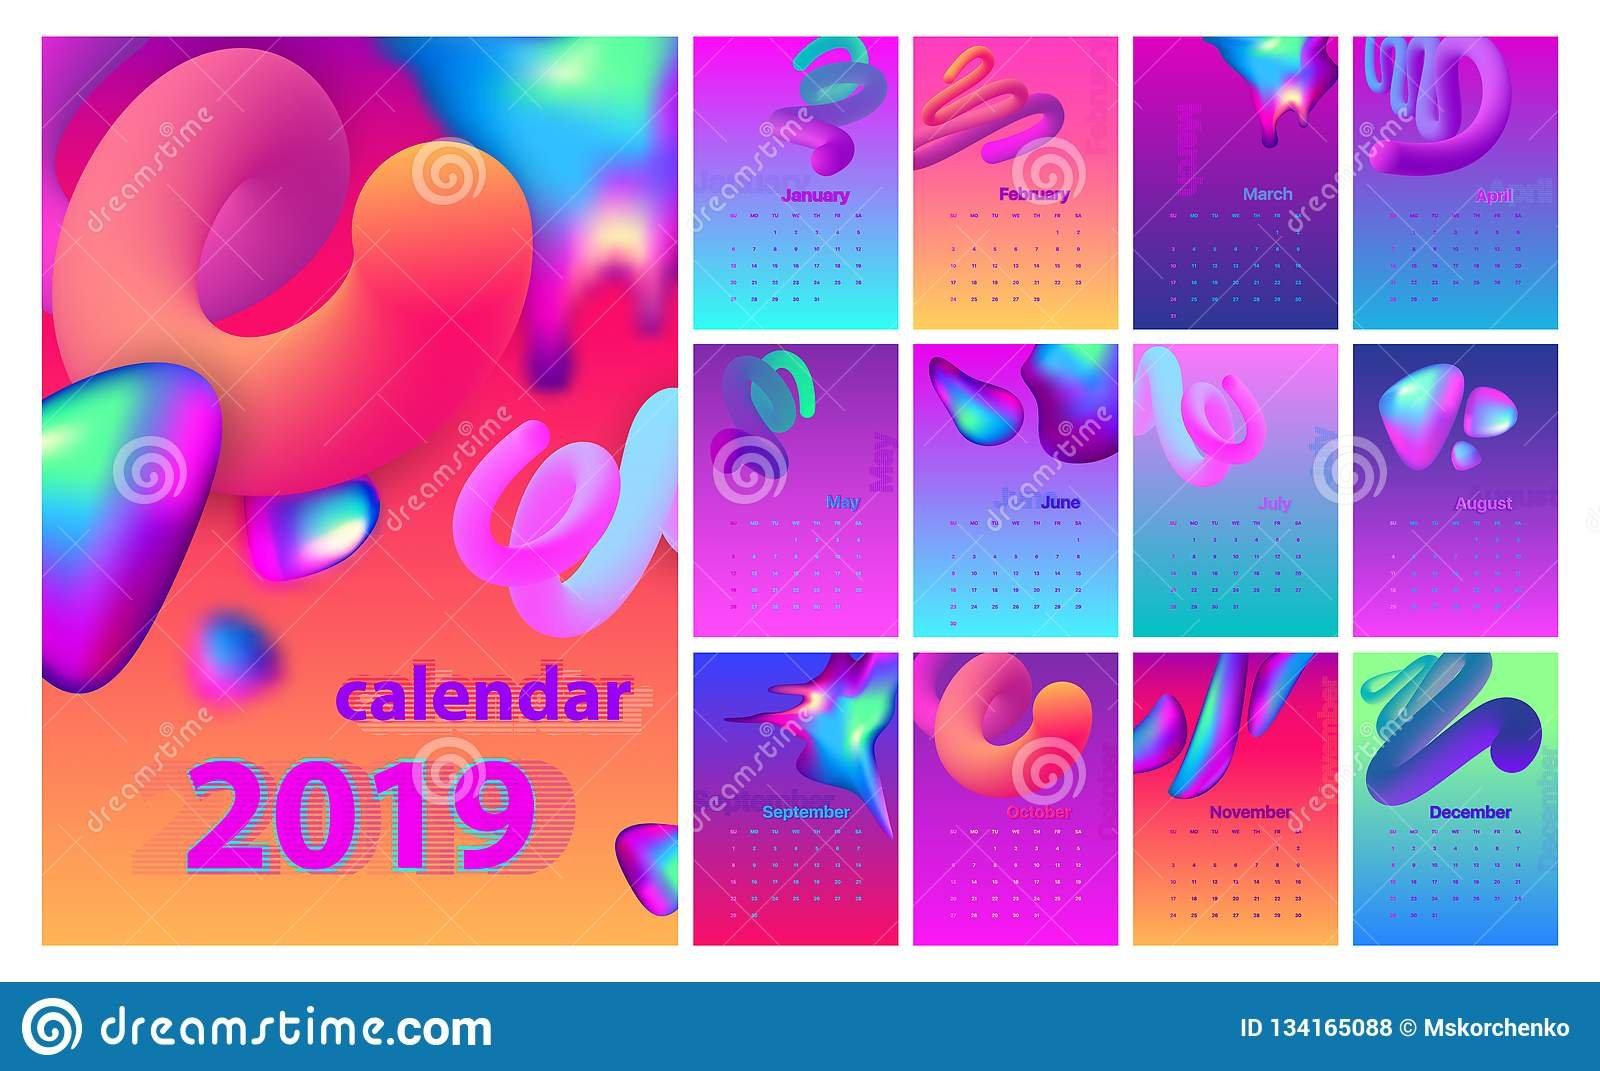 Abstract Minimal Calendar Design For 2019. Colorful Set. Stock Calendar 2019 Cool